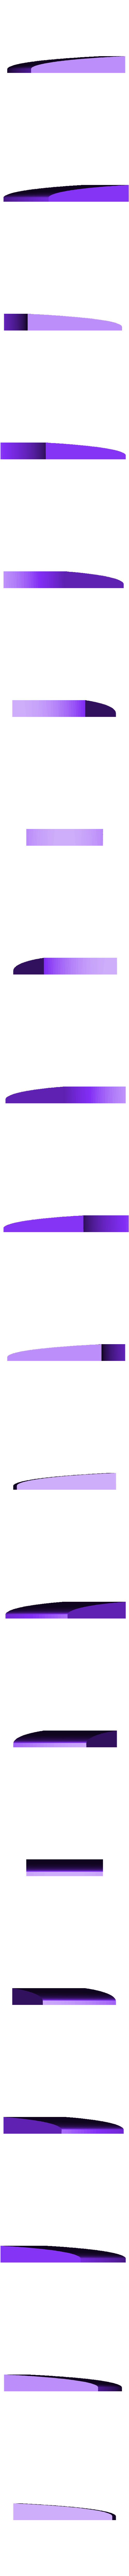 ts_band_l.stl Download free STL file Minion door spyhole cover • 3D print design, uepsie